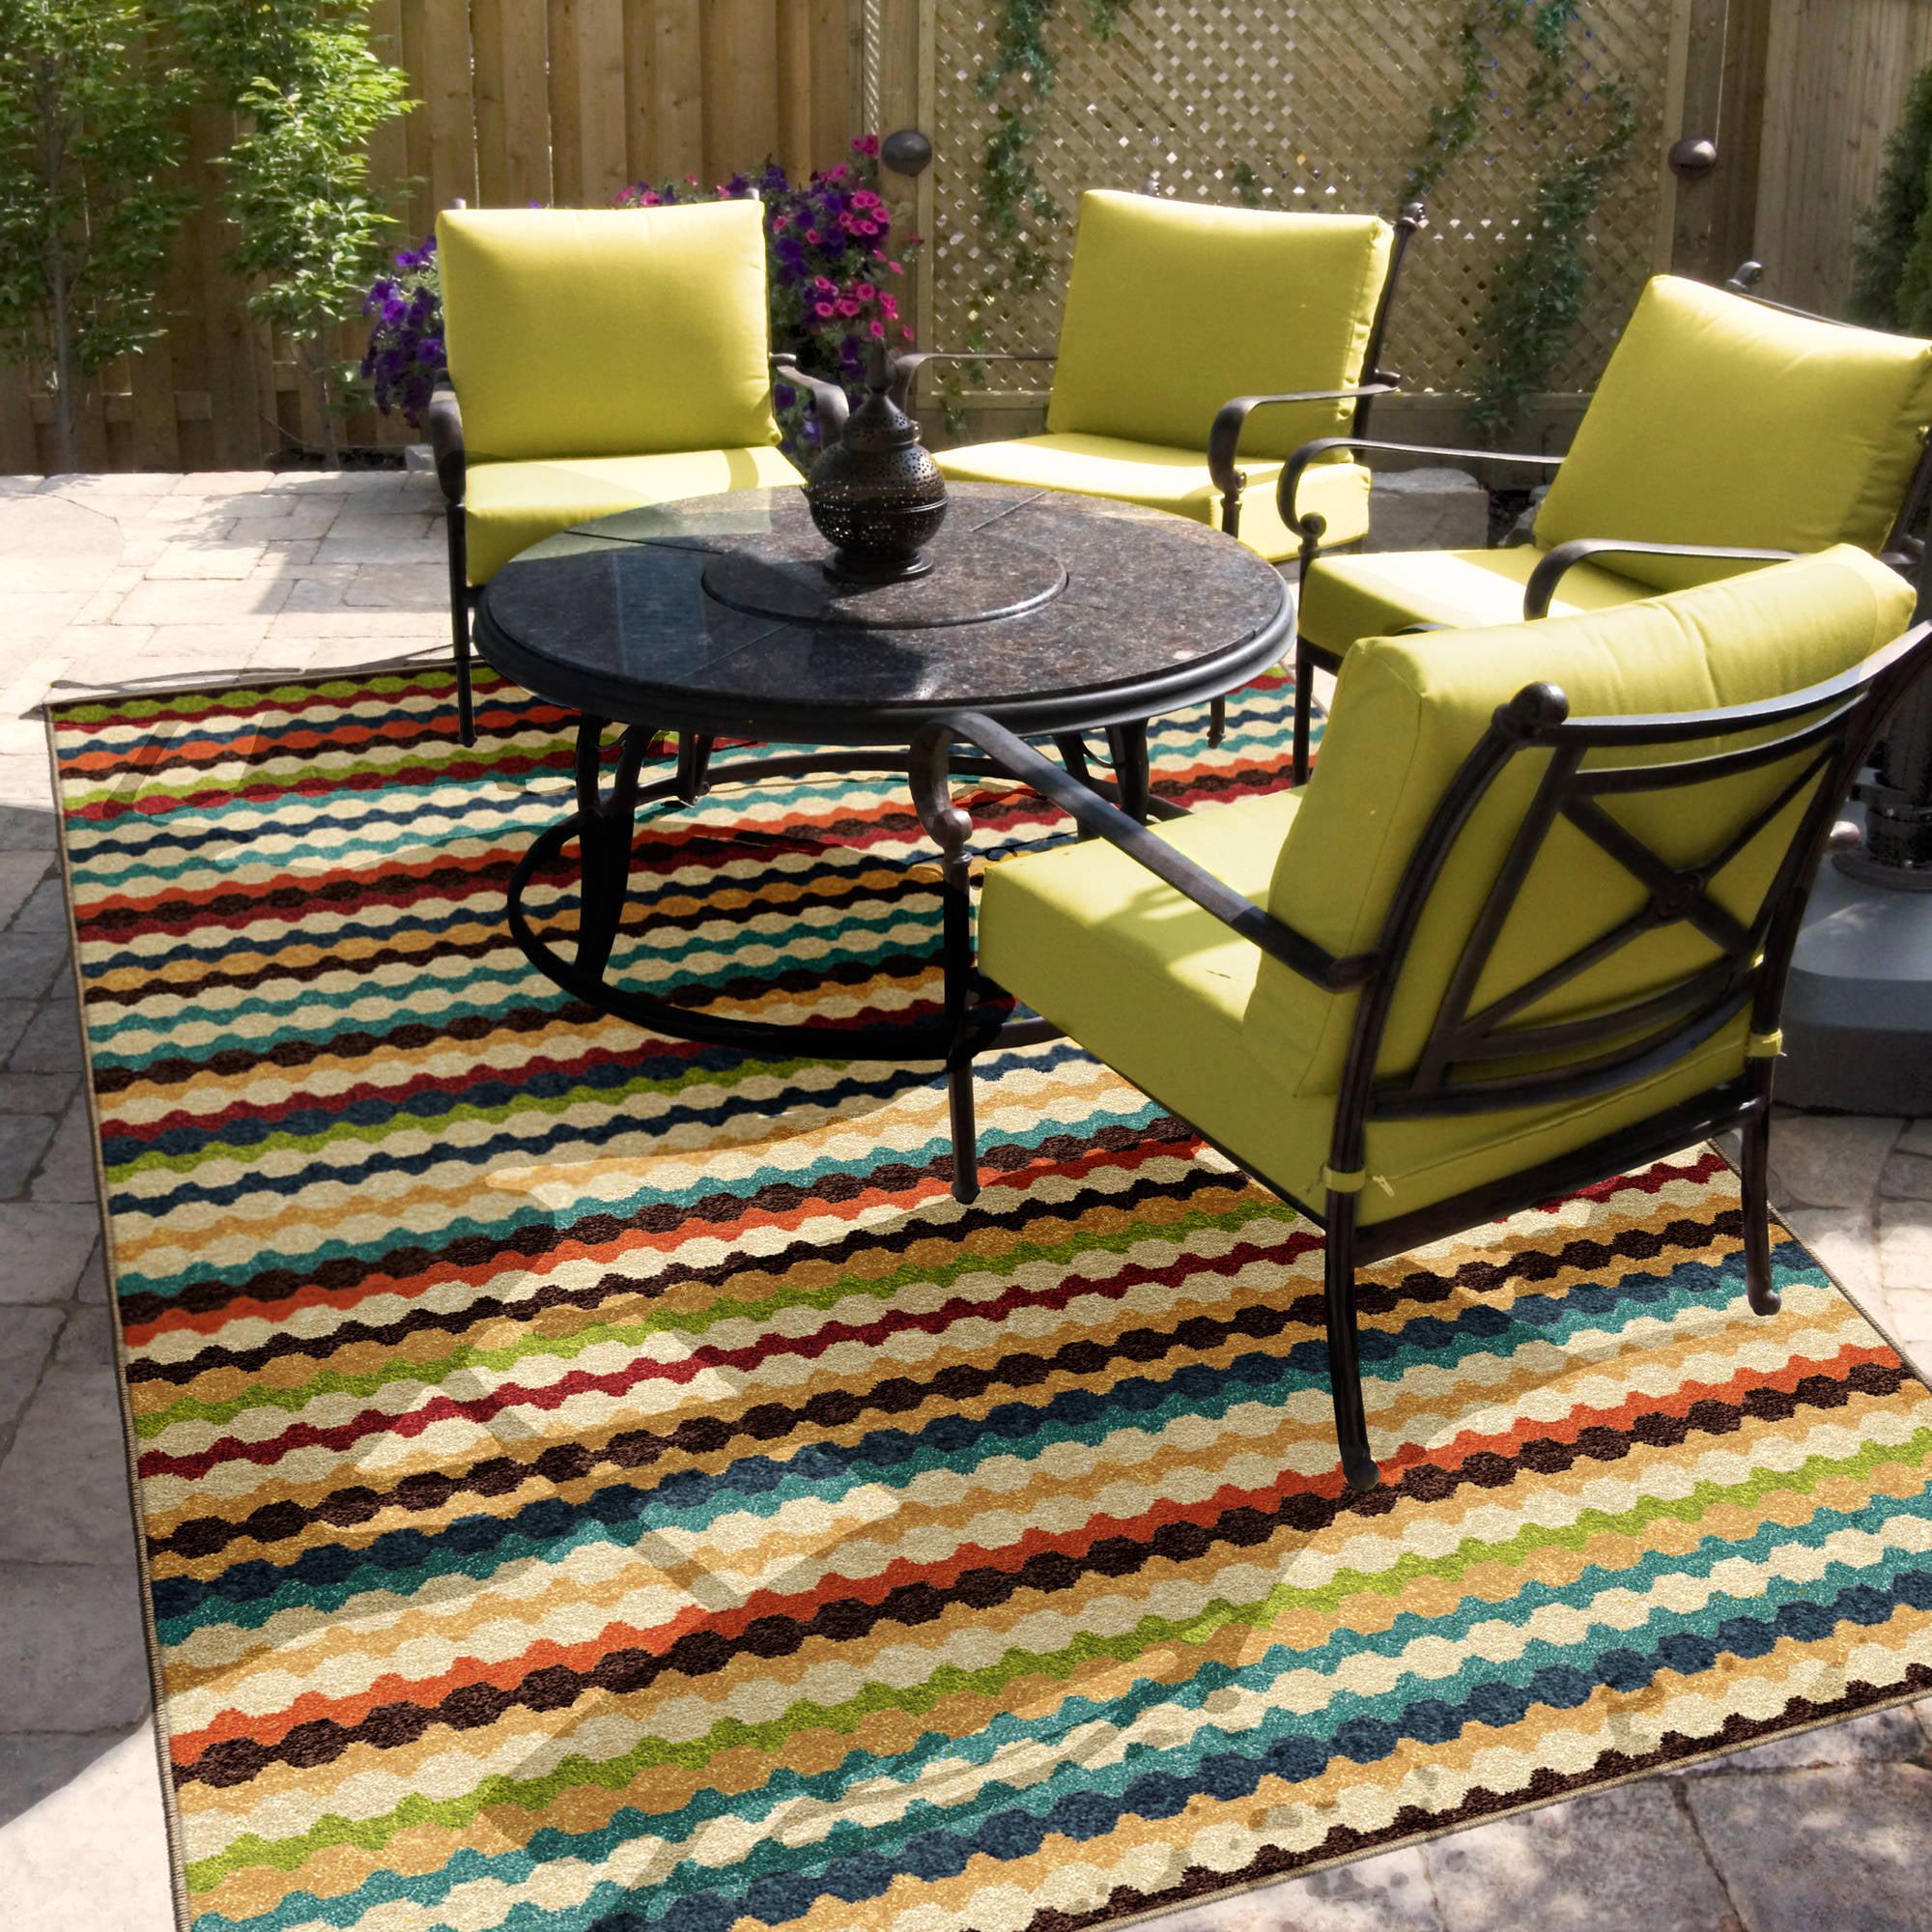 Orian Rugs Indoor Outdoor Nik Nak Multi Colored Area Rug or Runner